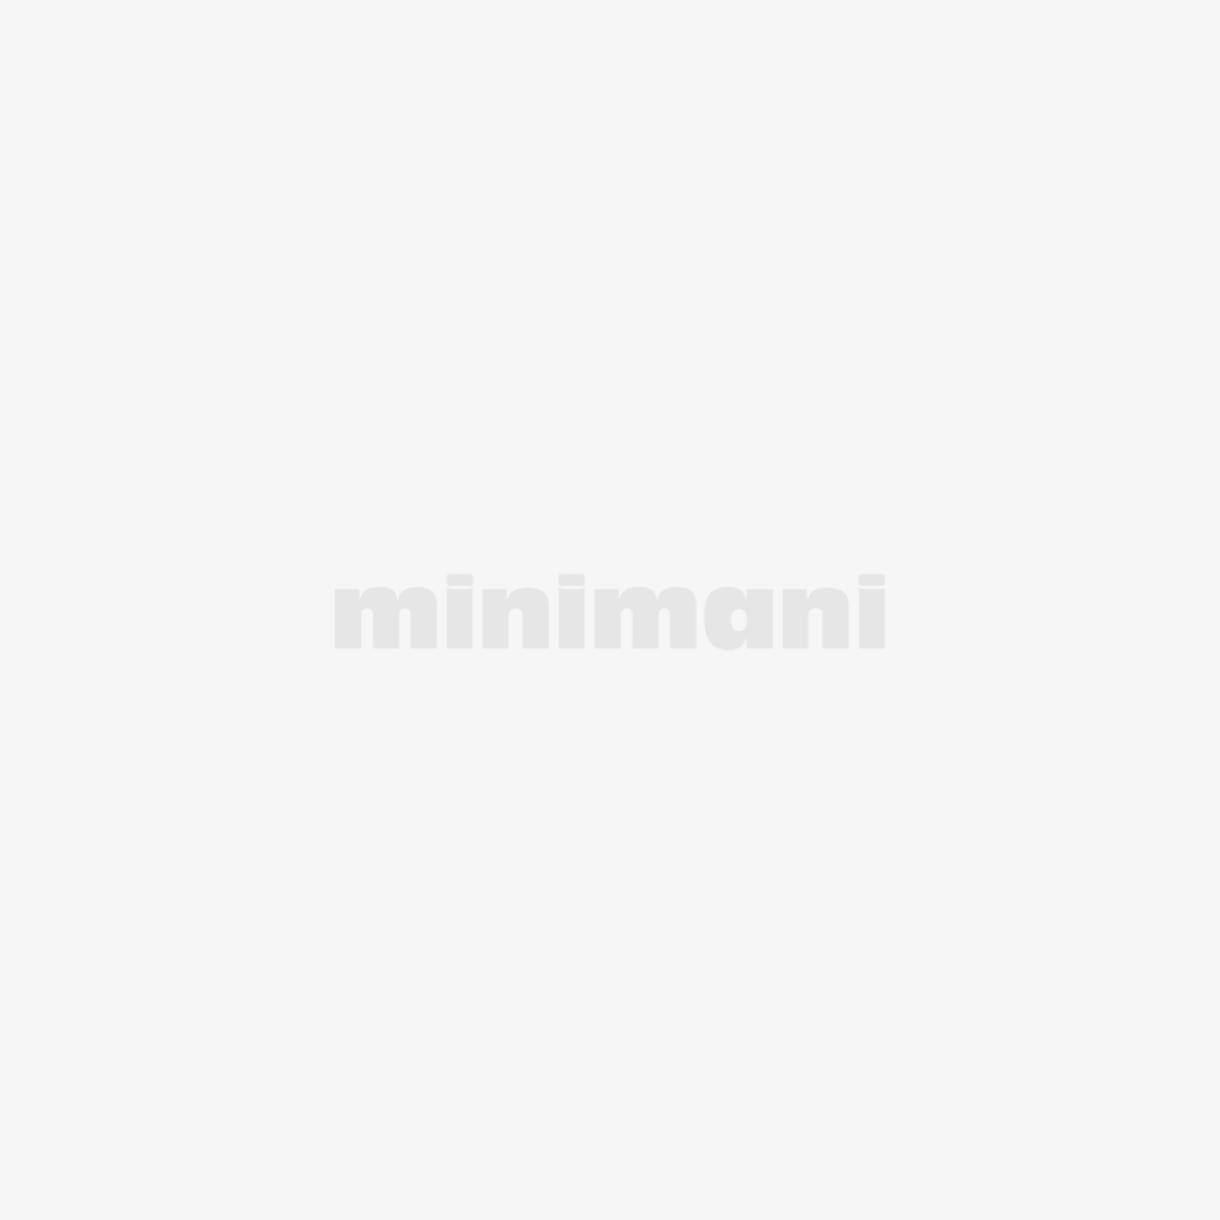 M-FILTER RAITISILMASUODATIN MAC 8060 ASTRA G, ZAFIRA I,II